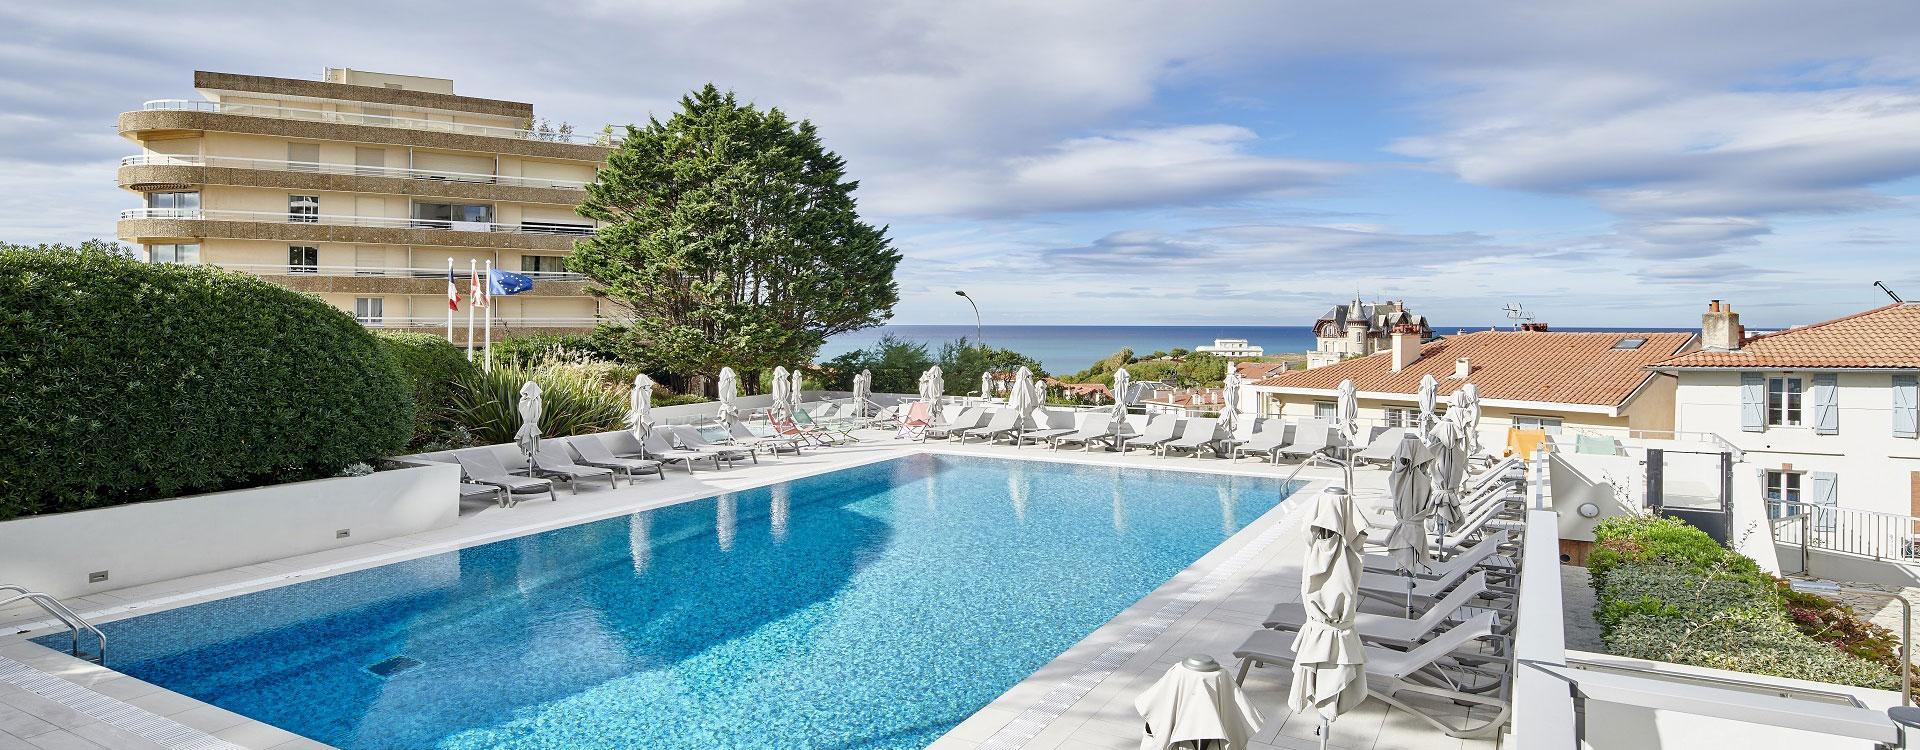 piscine residence grand large biarritz